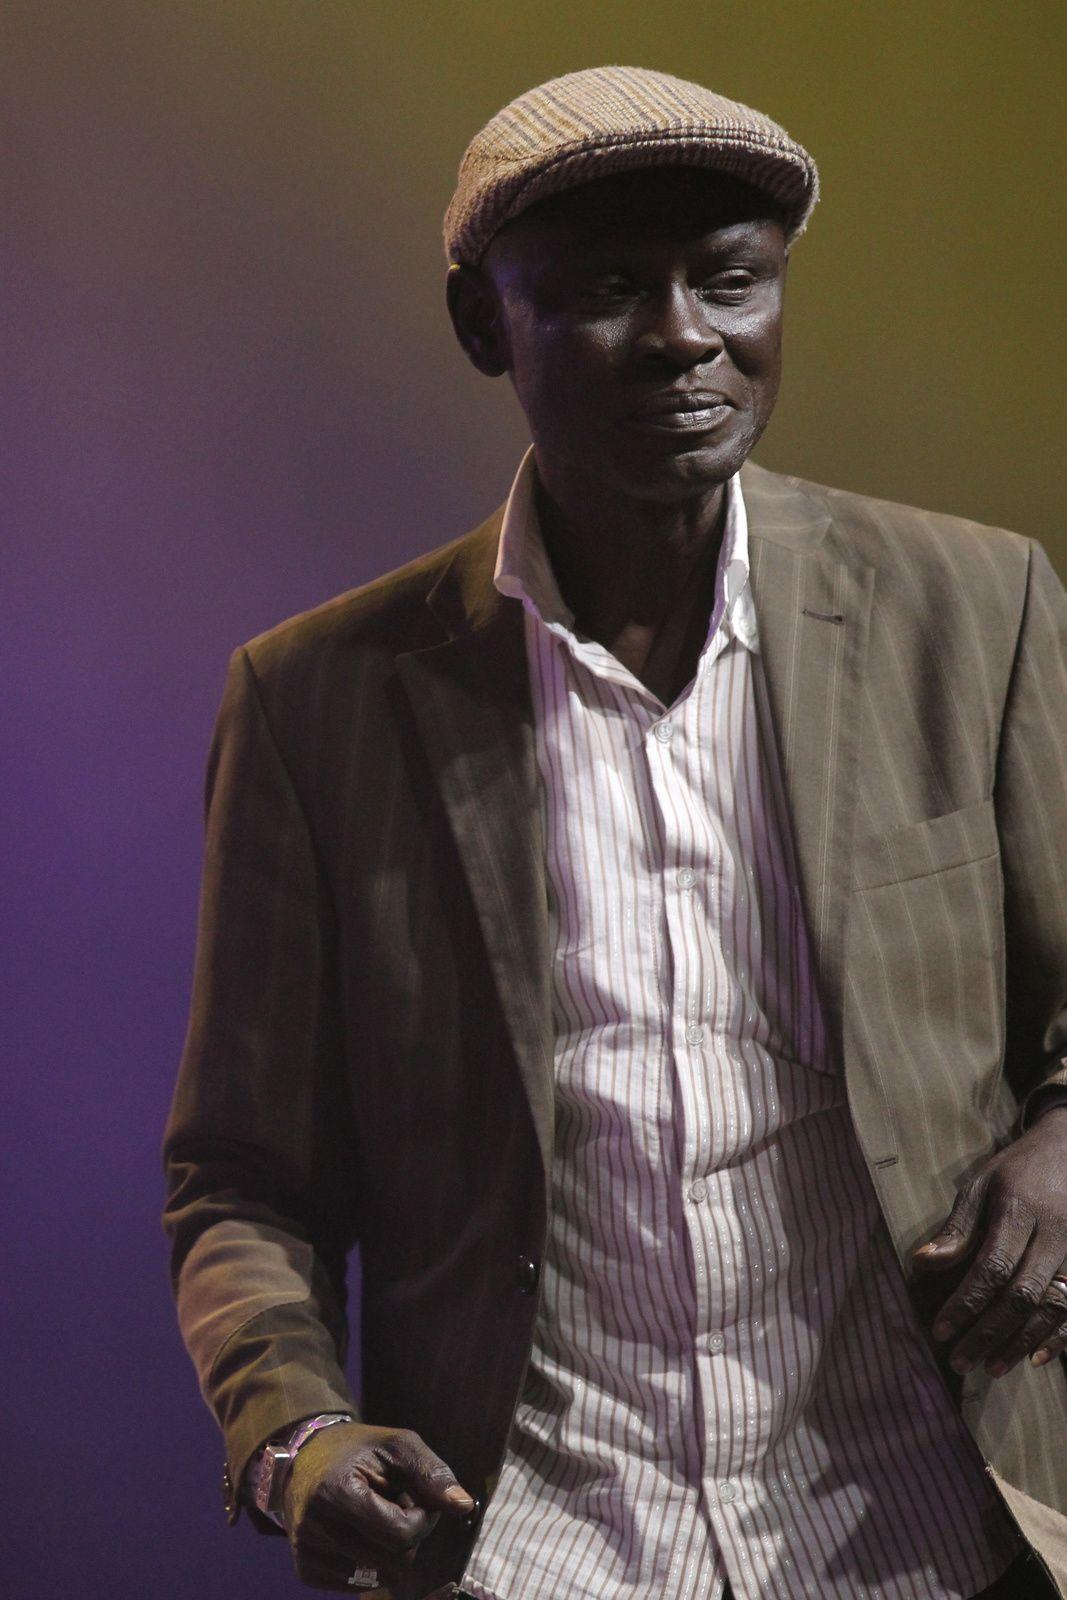 Africando, Tí&pica 73, Orchesta Broadway, Salsafon, Saboratrova, Louis-Philippe Dalembert…Instantes...